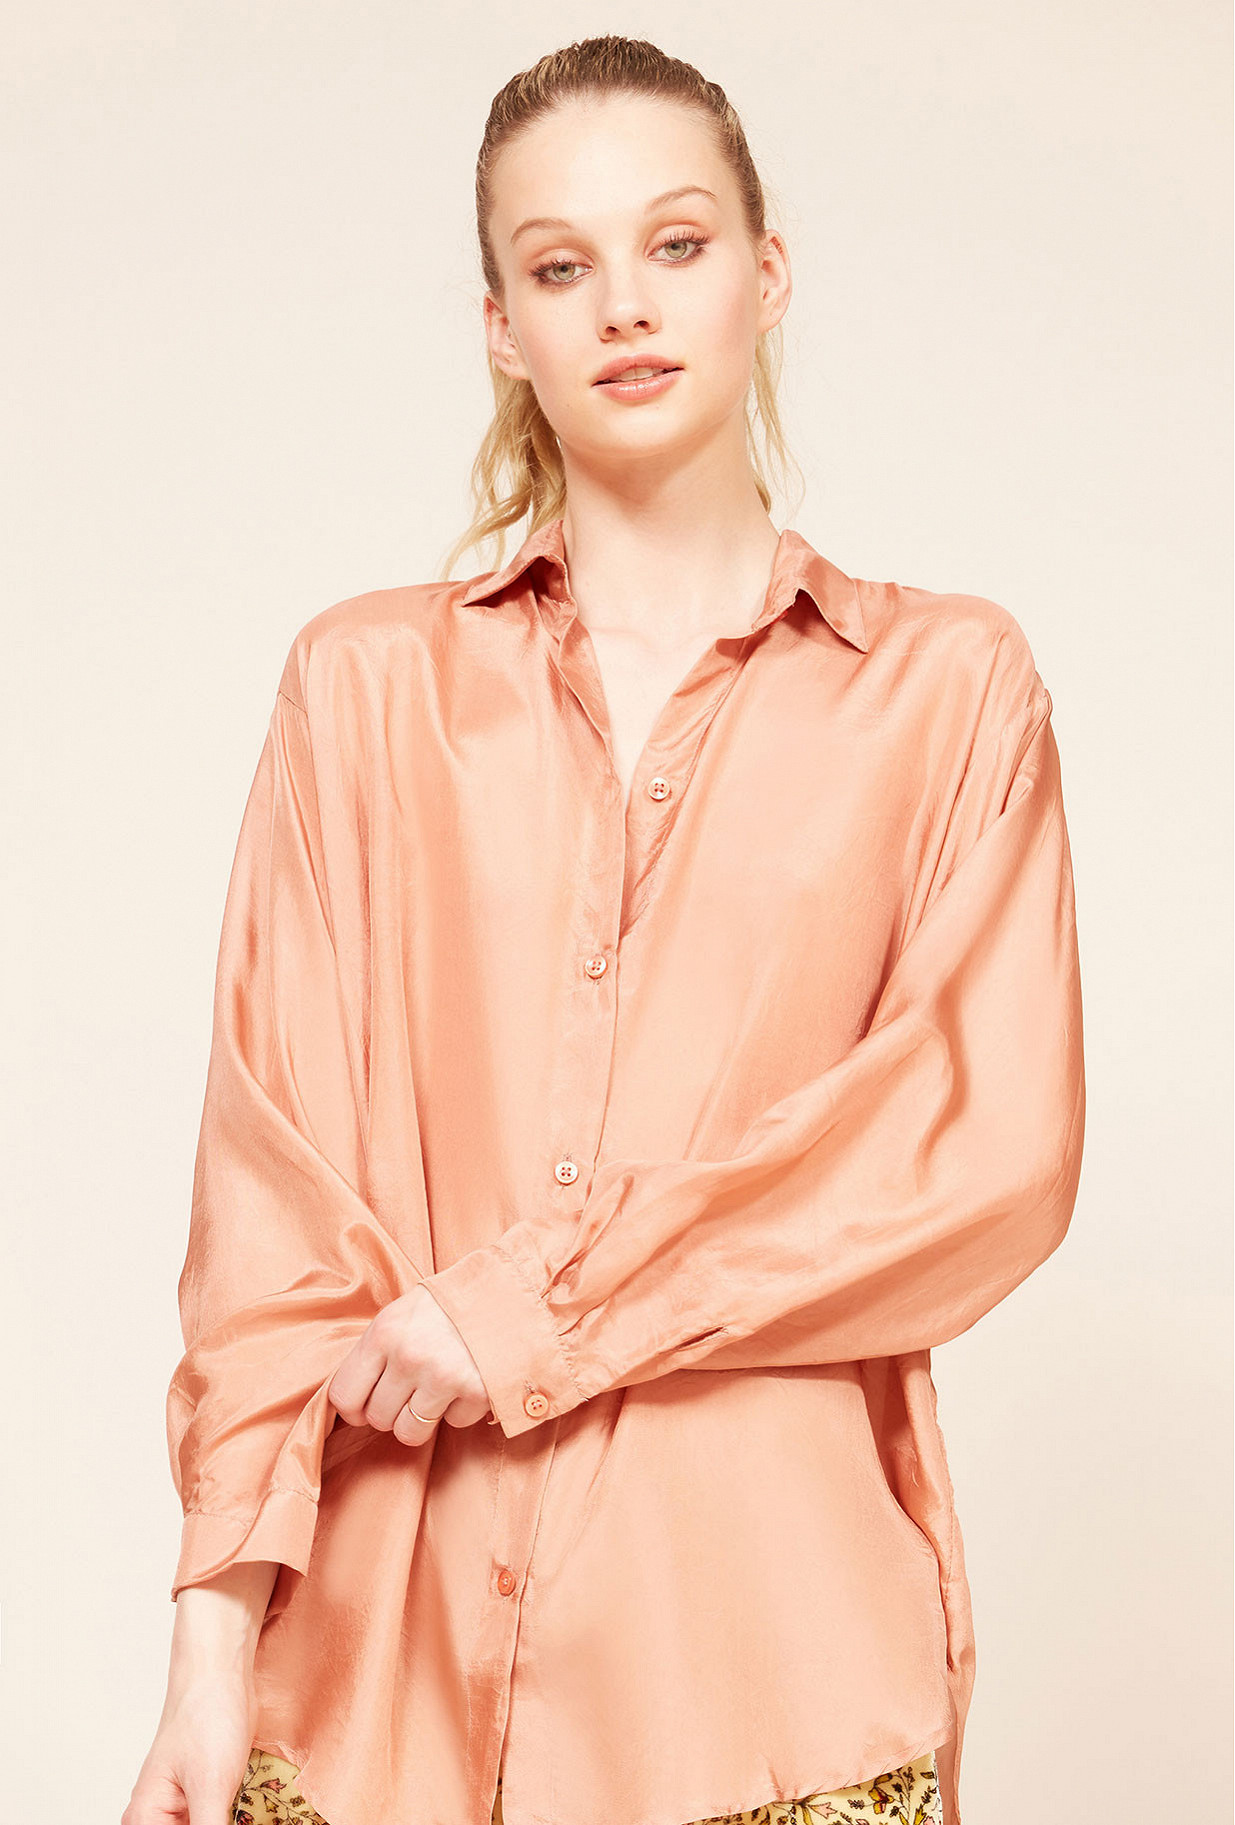 Paris clothes store Shirt  Magal french designer fashion Paris